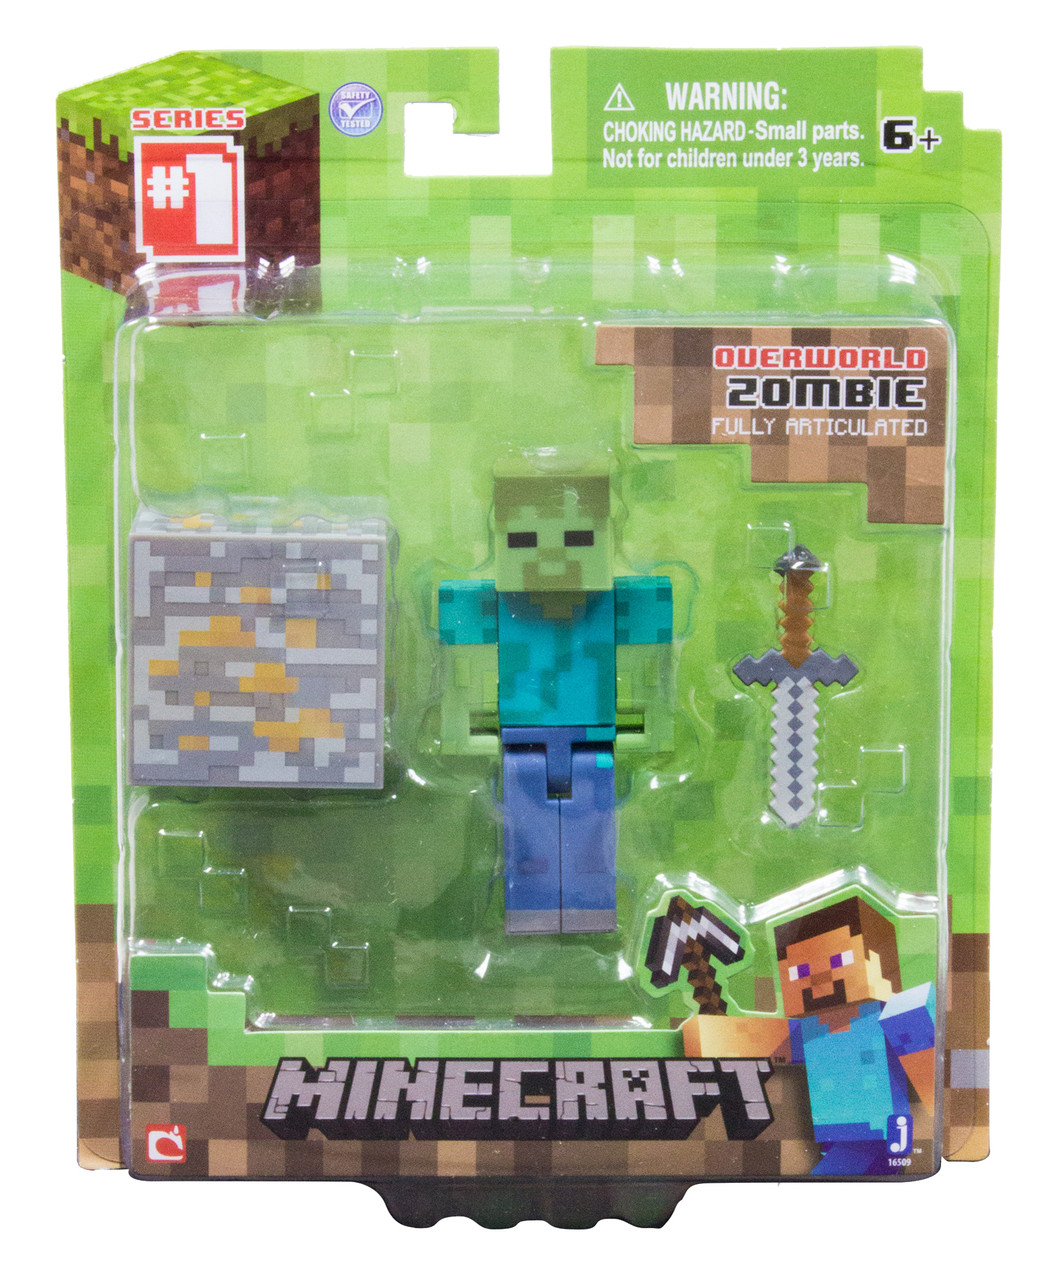 Minecraft - Overworld ZOMBIE